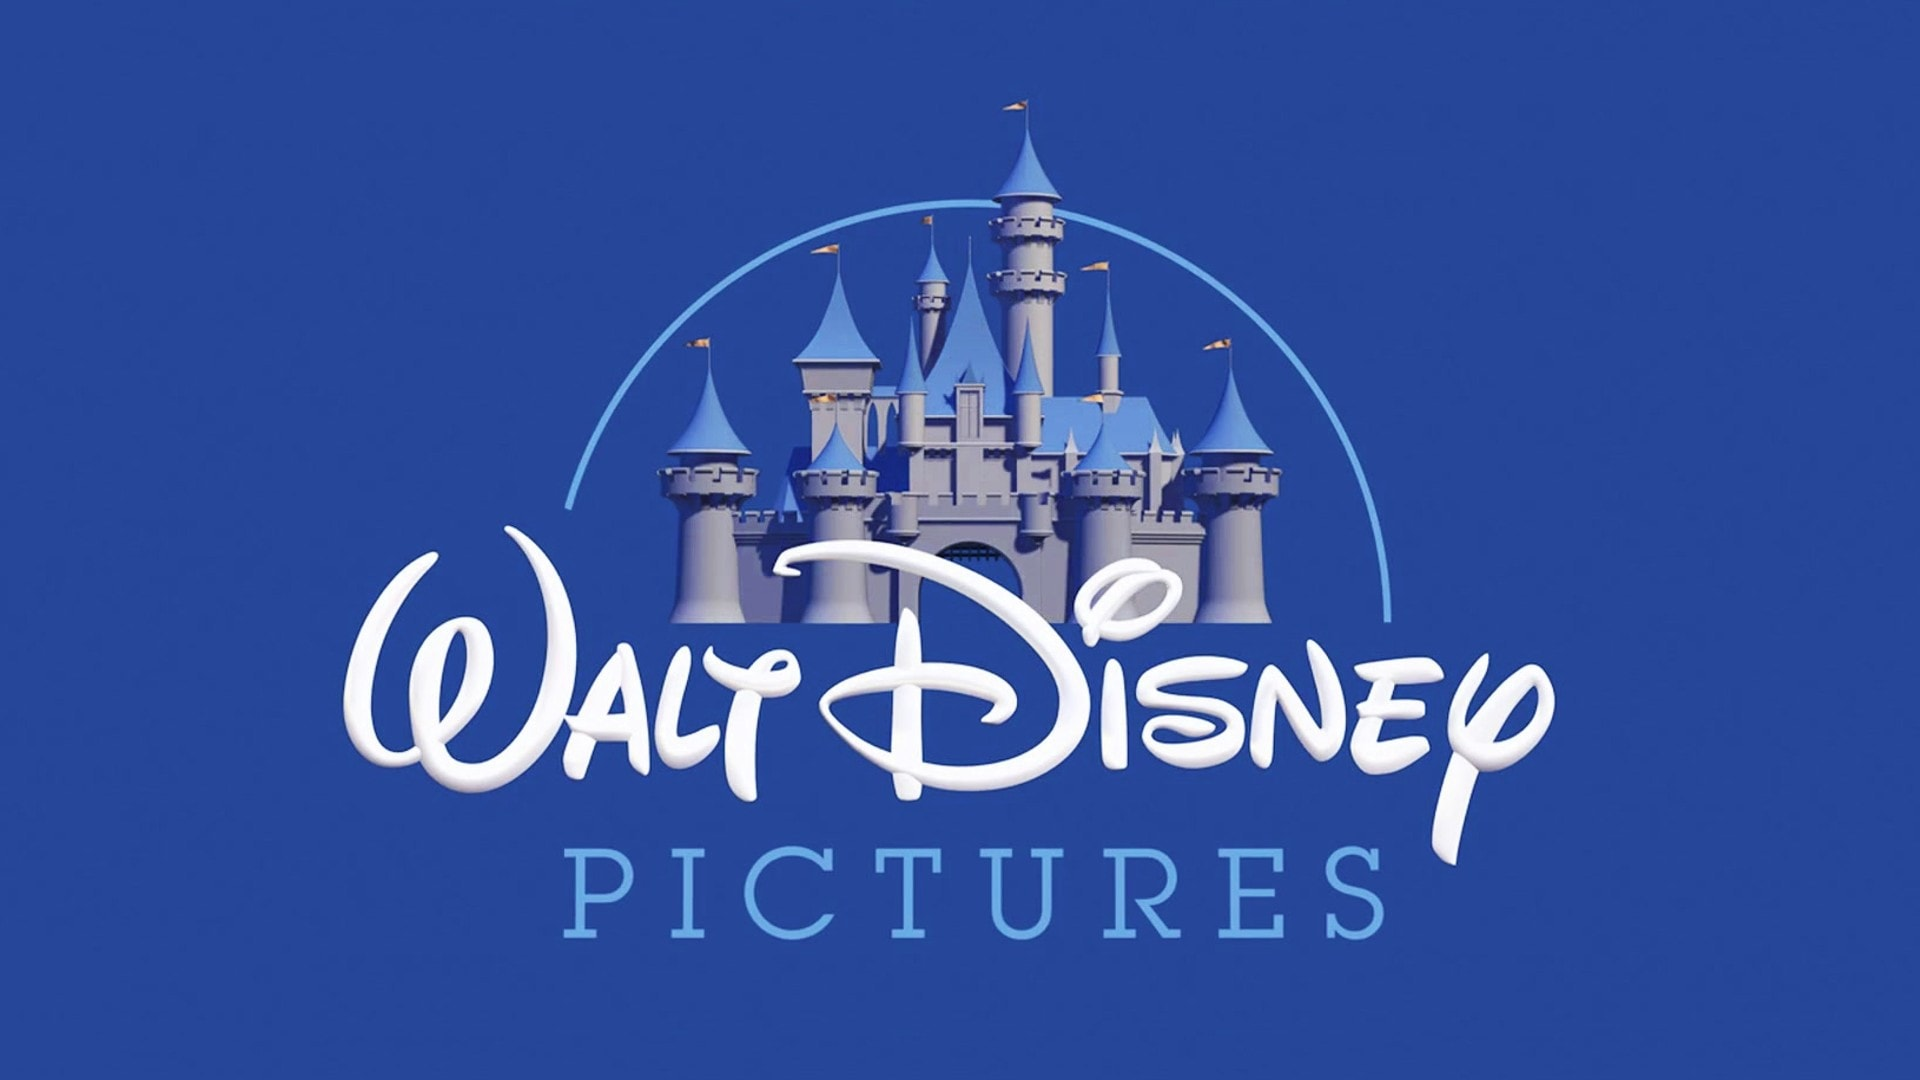 Walt Disney - Magical